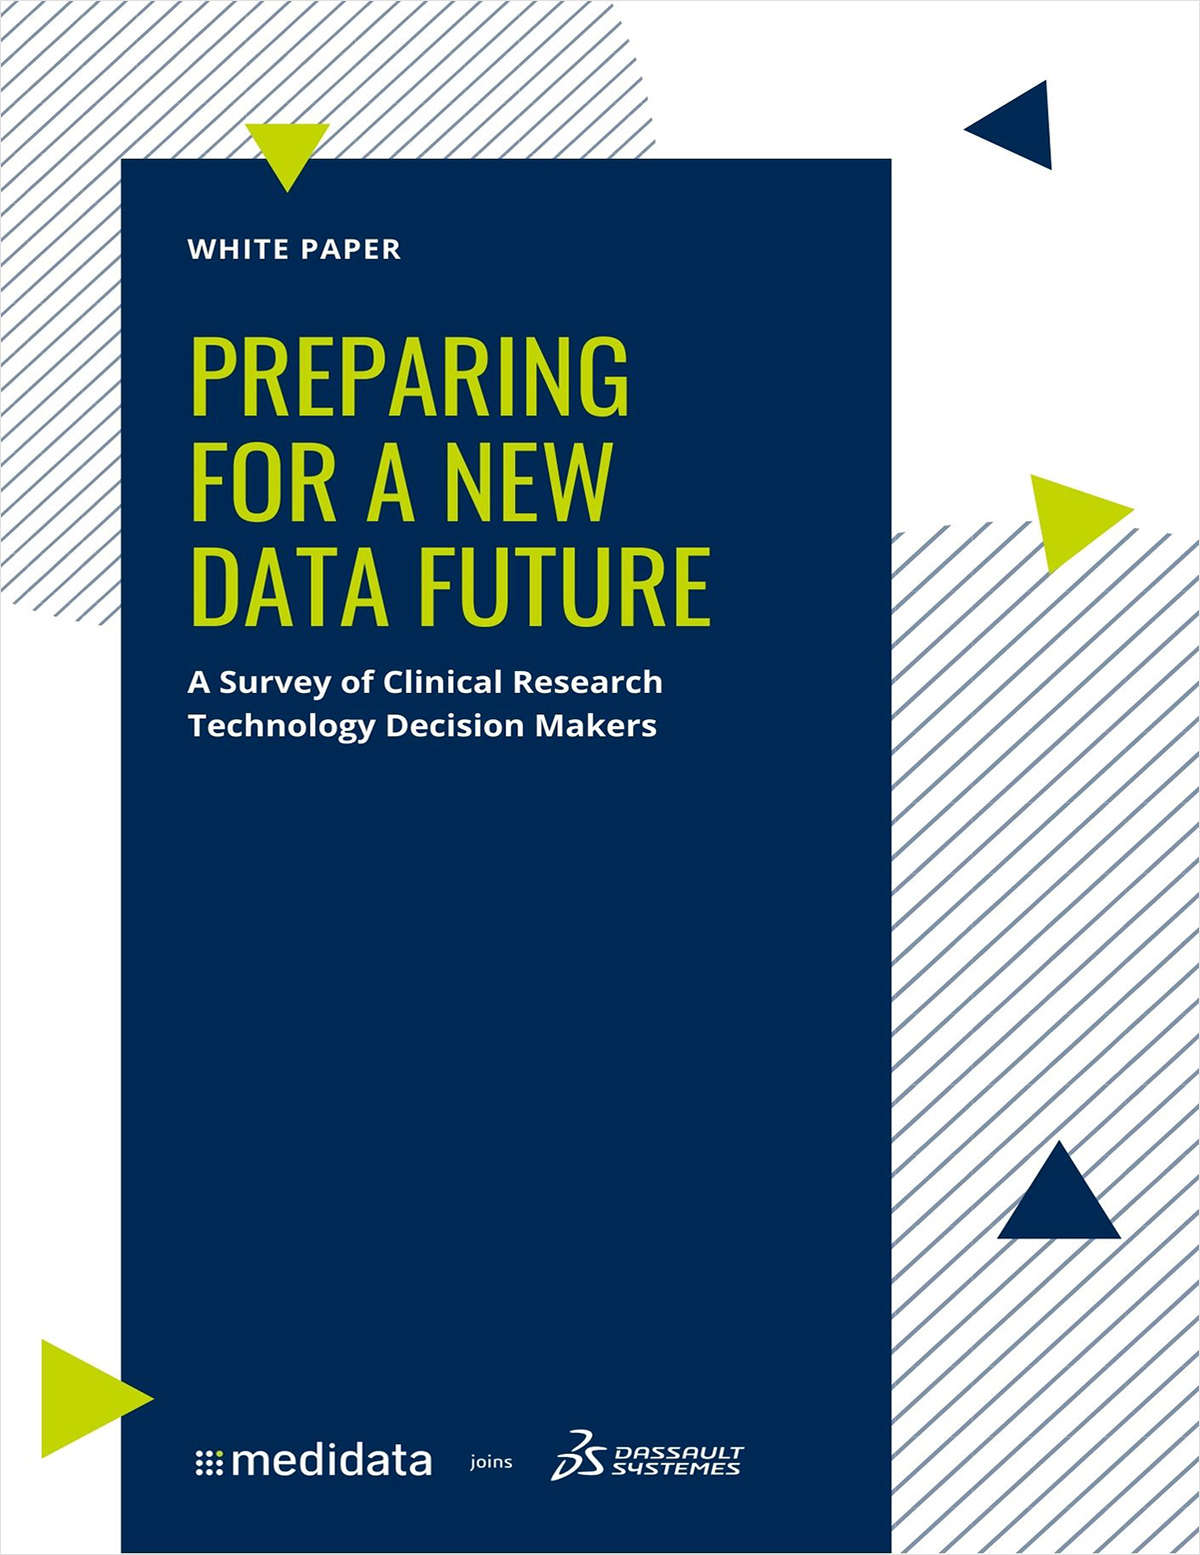 Preparing for a New Data Future: A Survey of CTOs